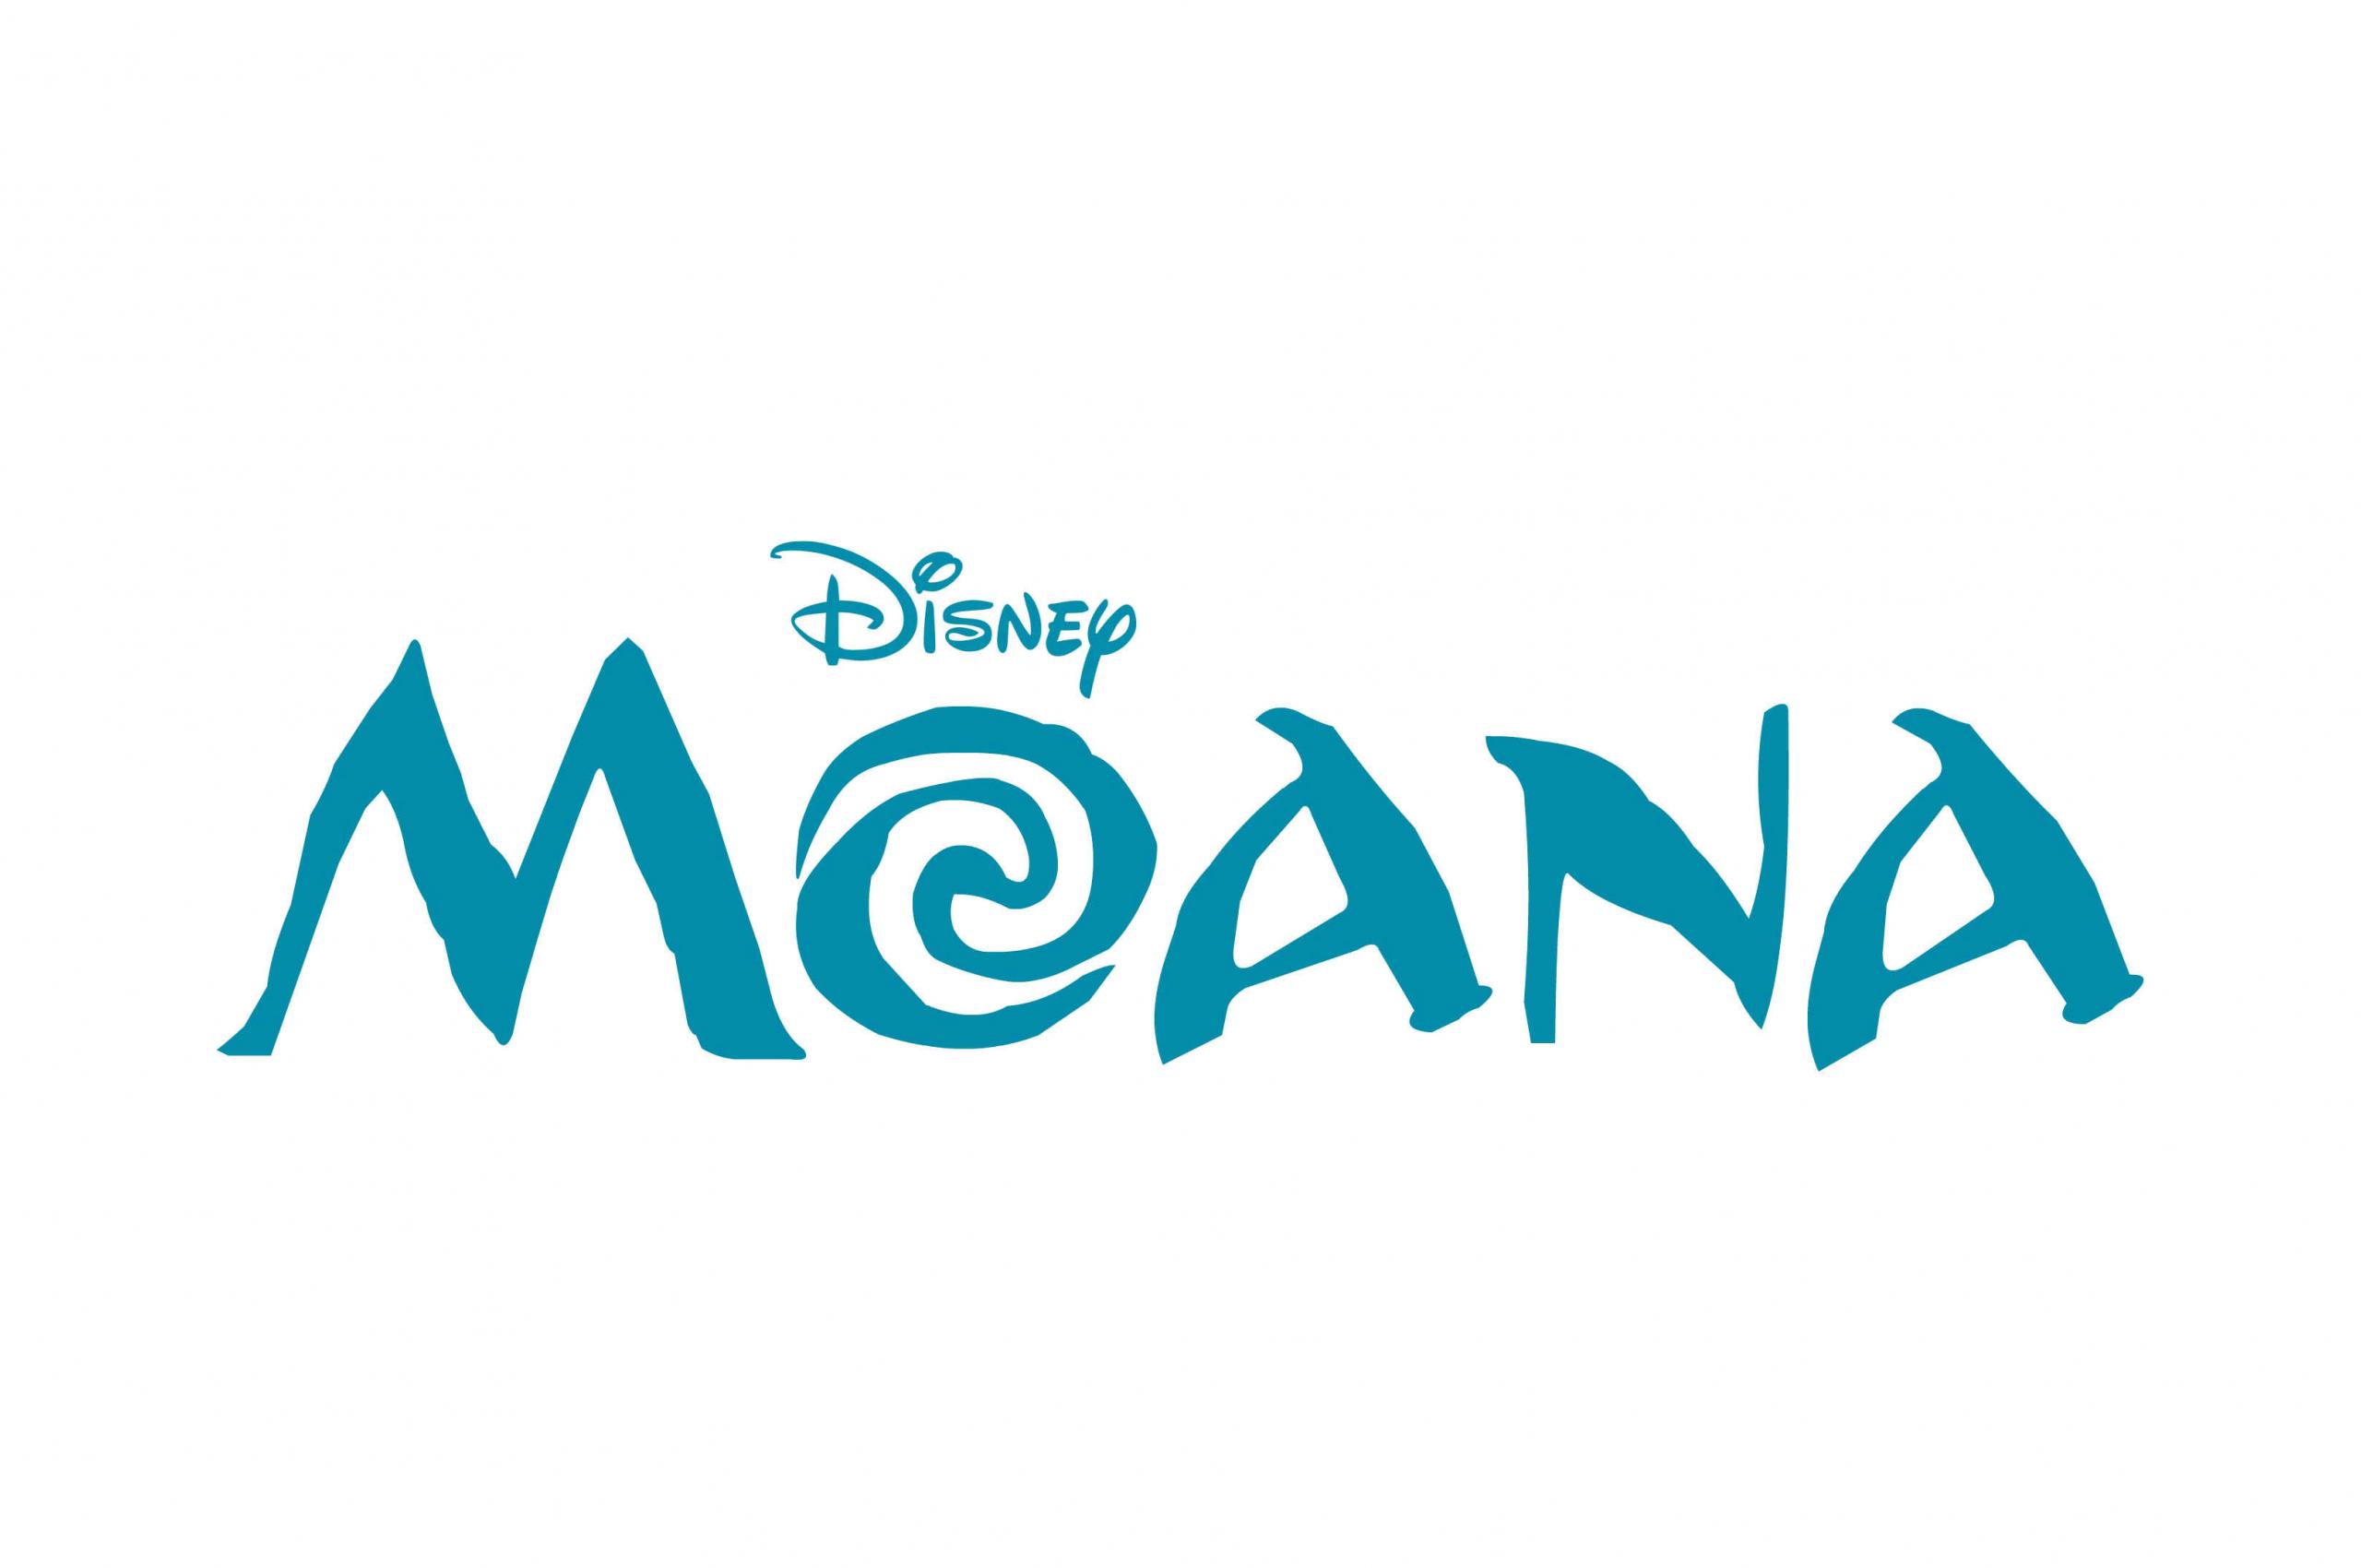 Disney Moana Wallpaper